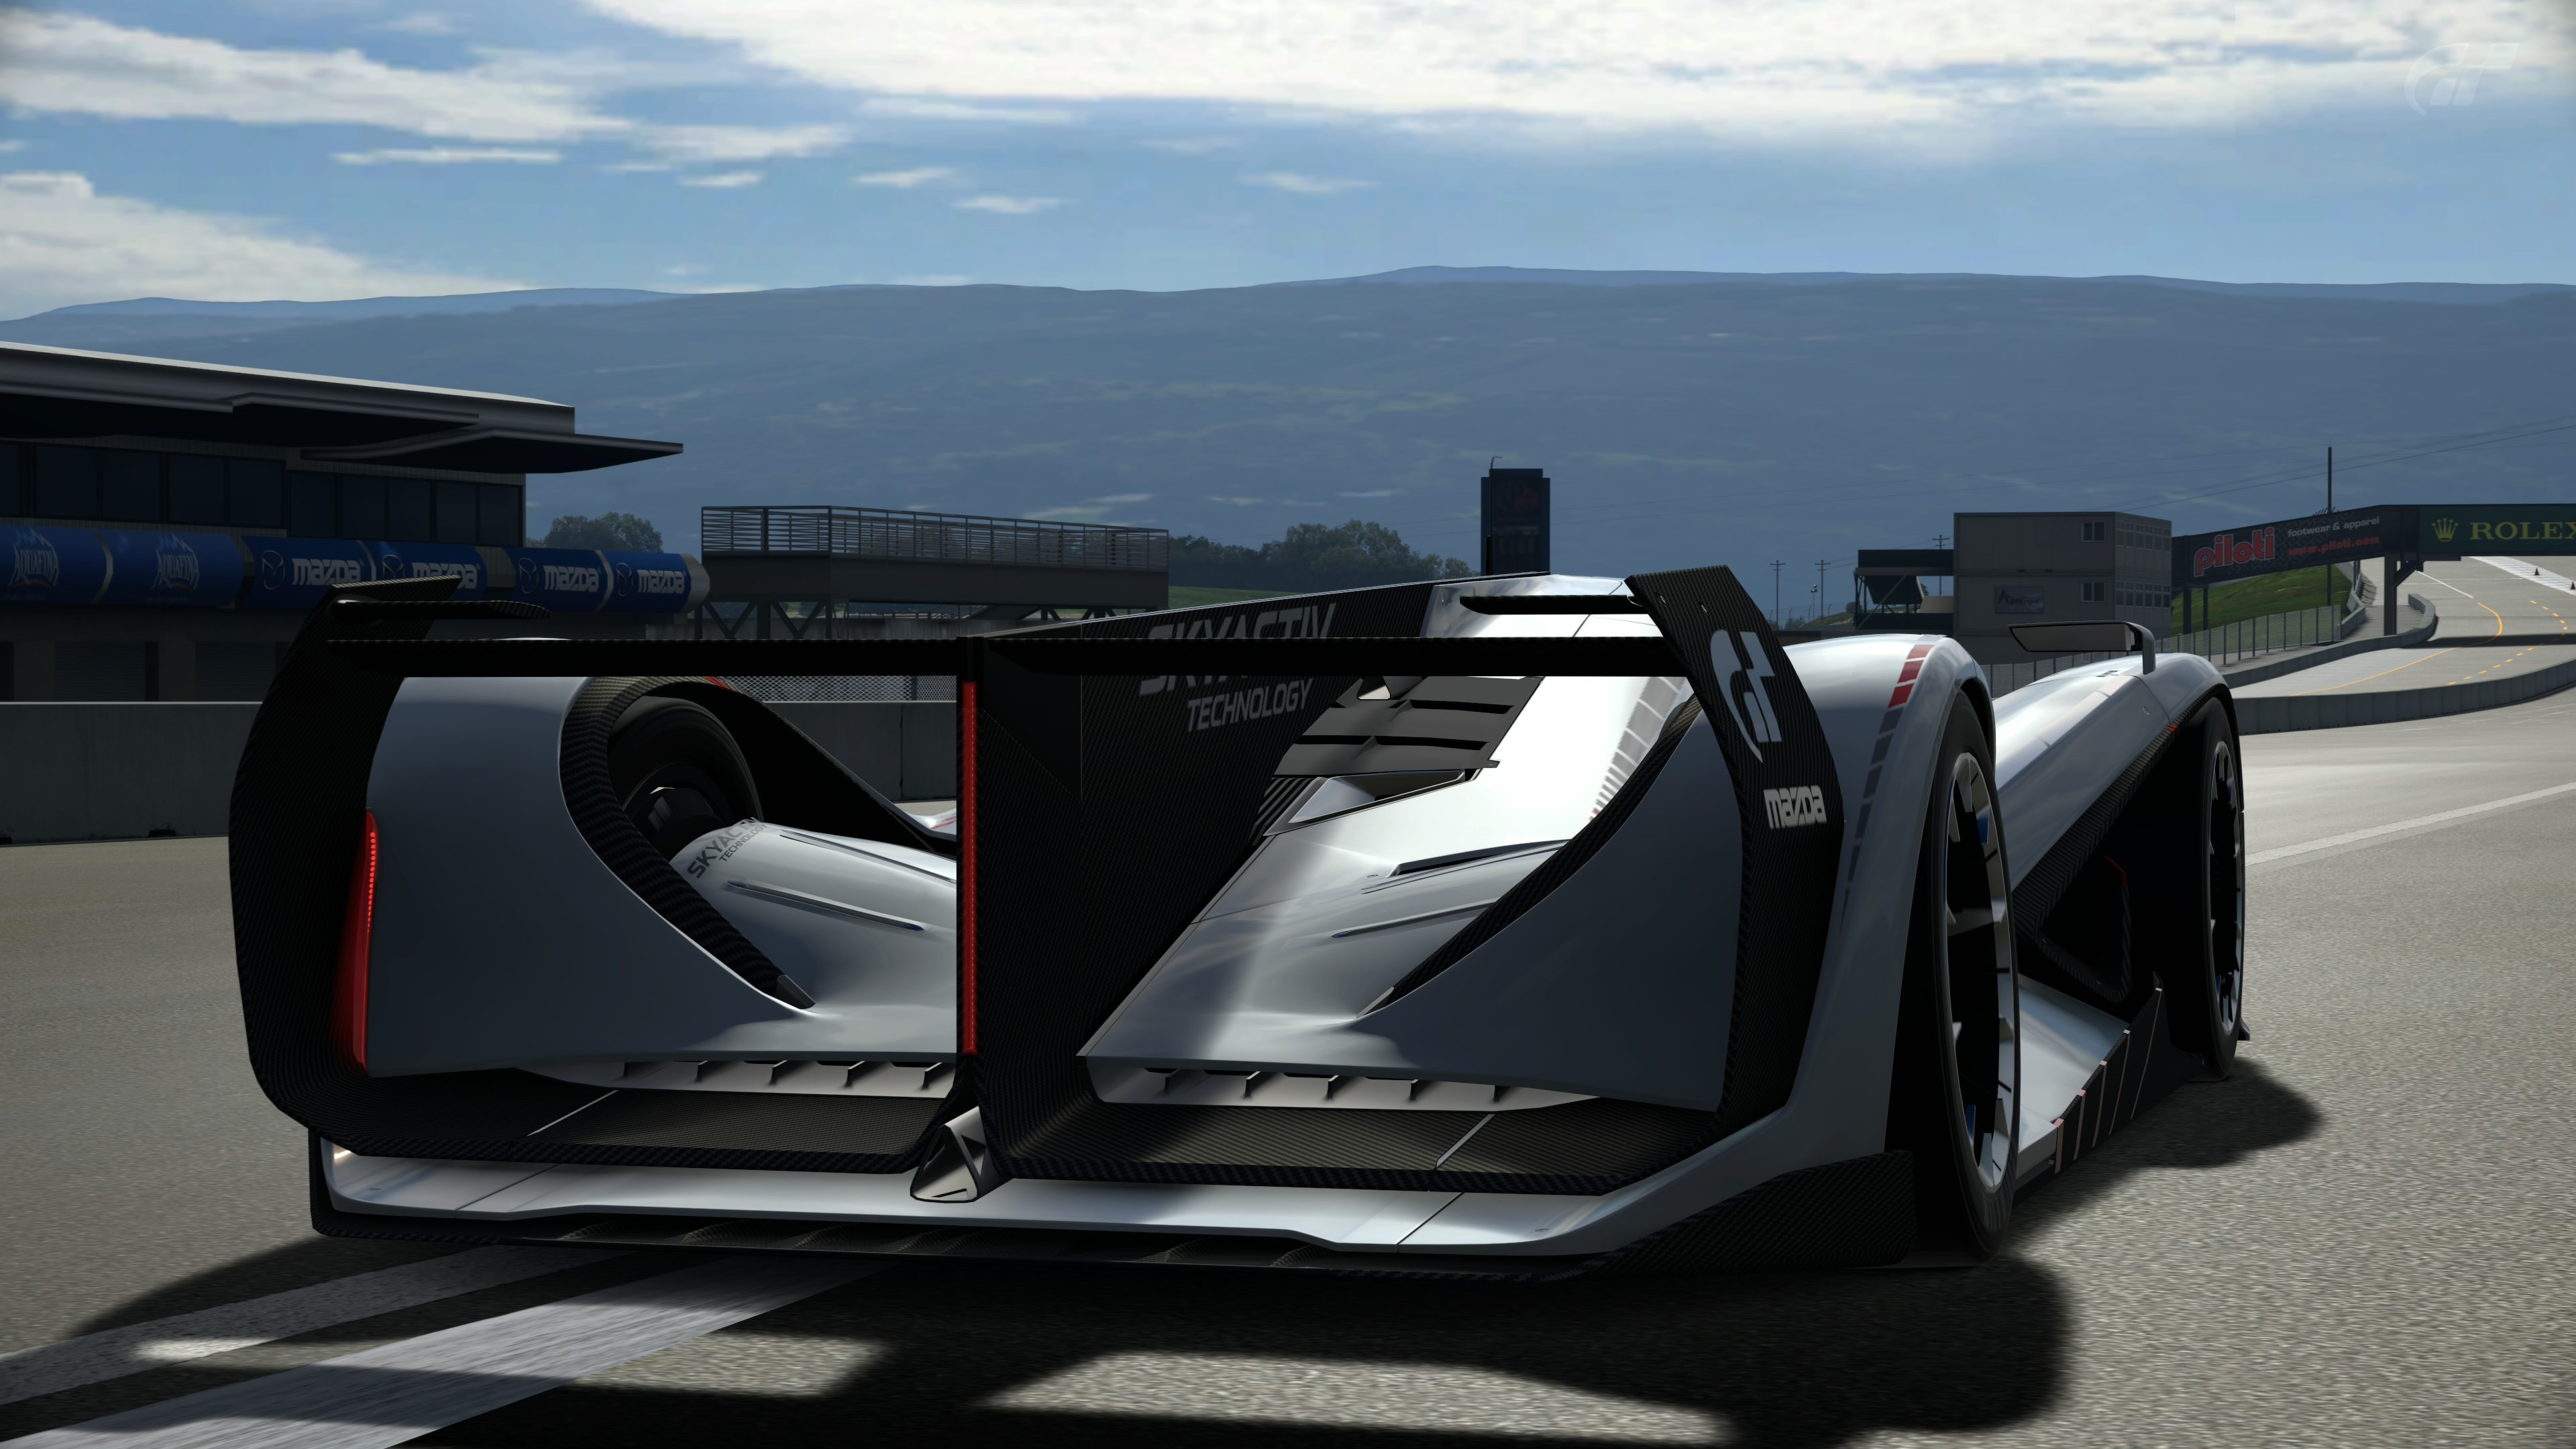 Mazda Raceway Laguna Seca _5.jpg